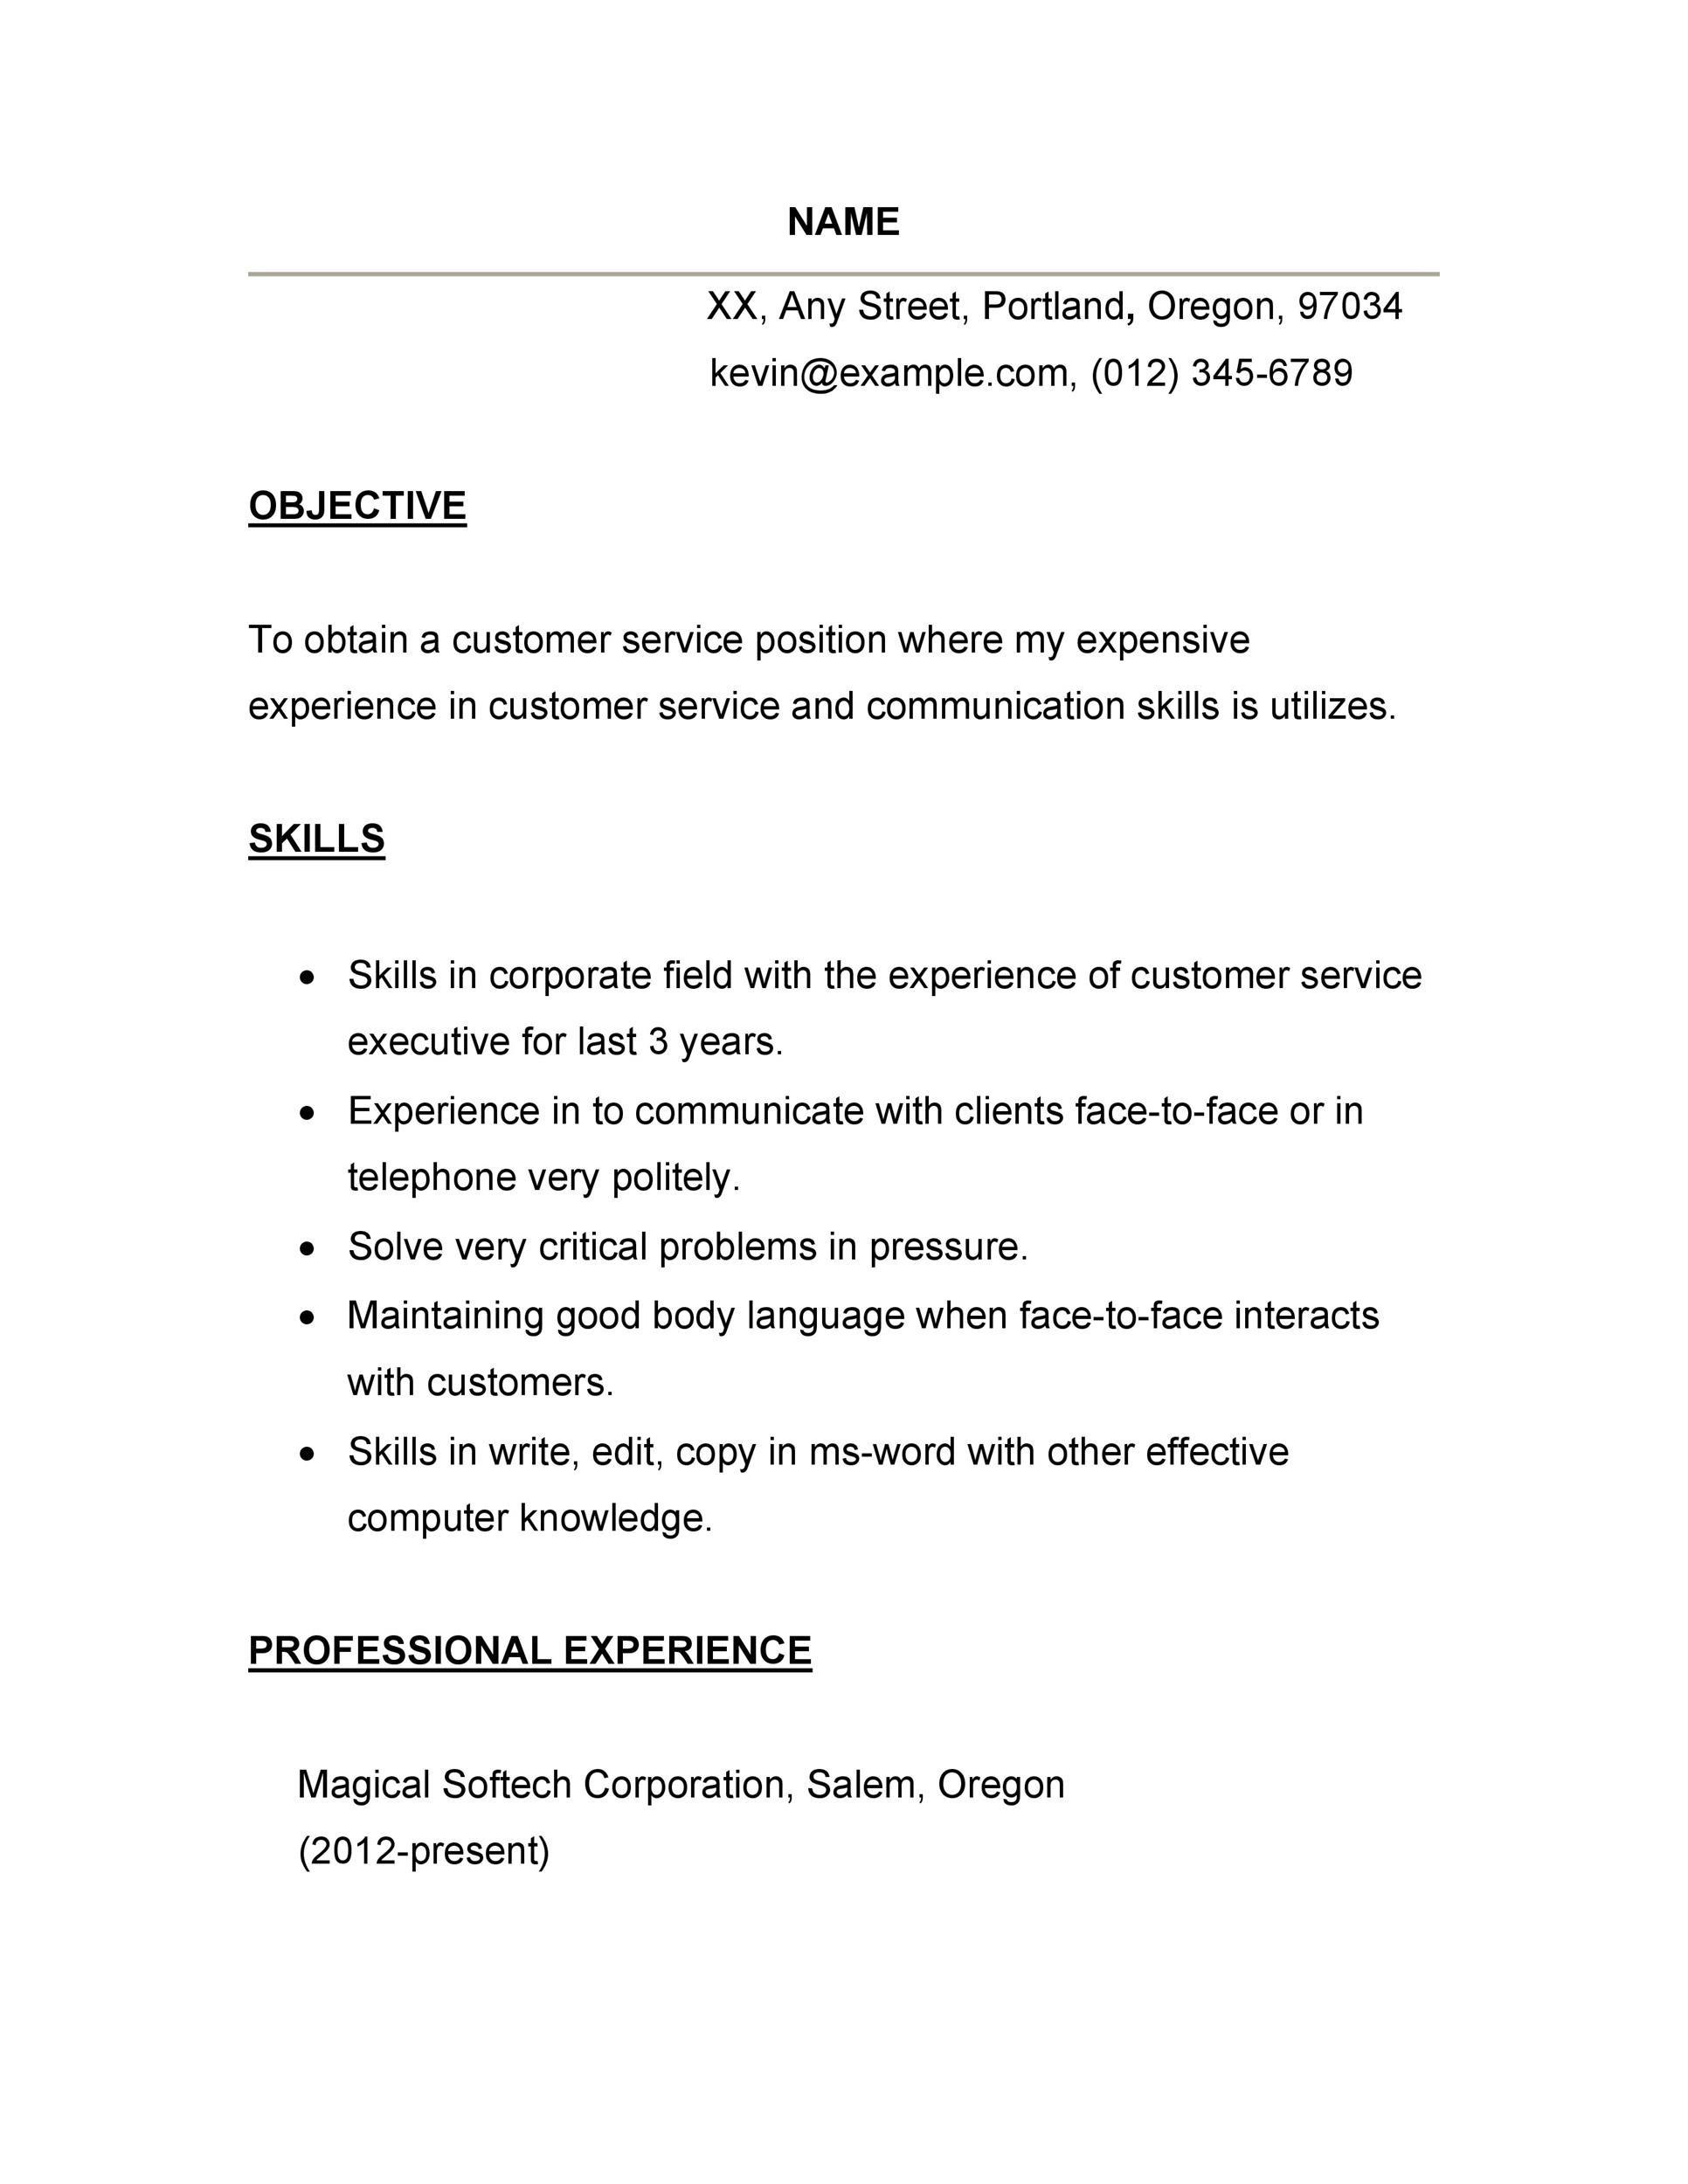 30 Customer Service Resume Examples ᐅ Templatelab